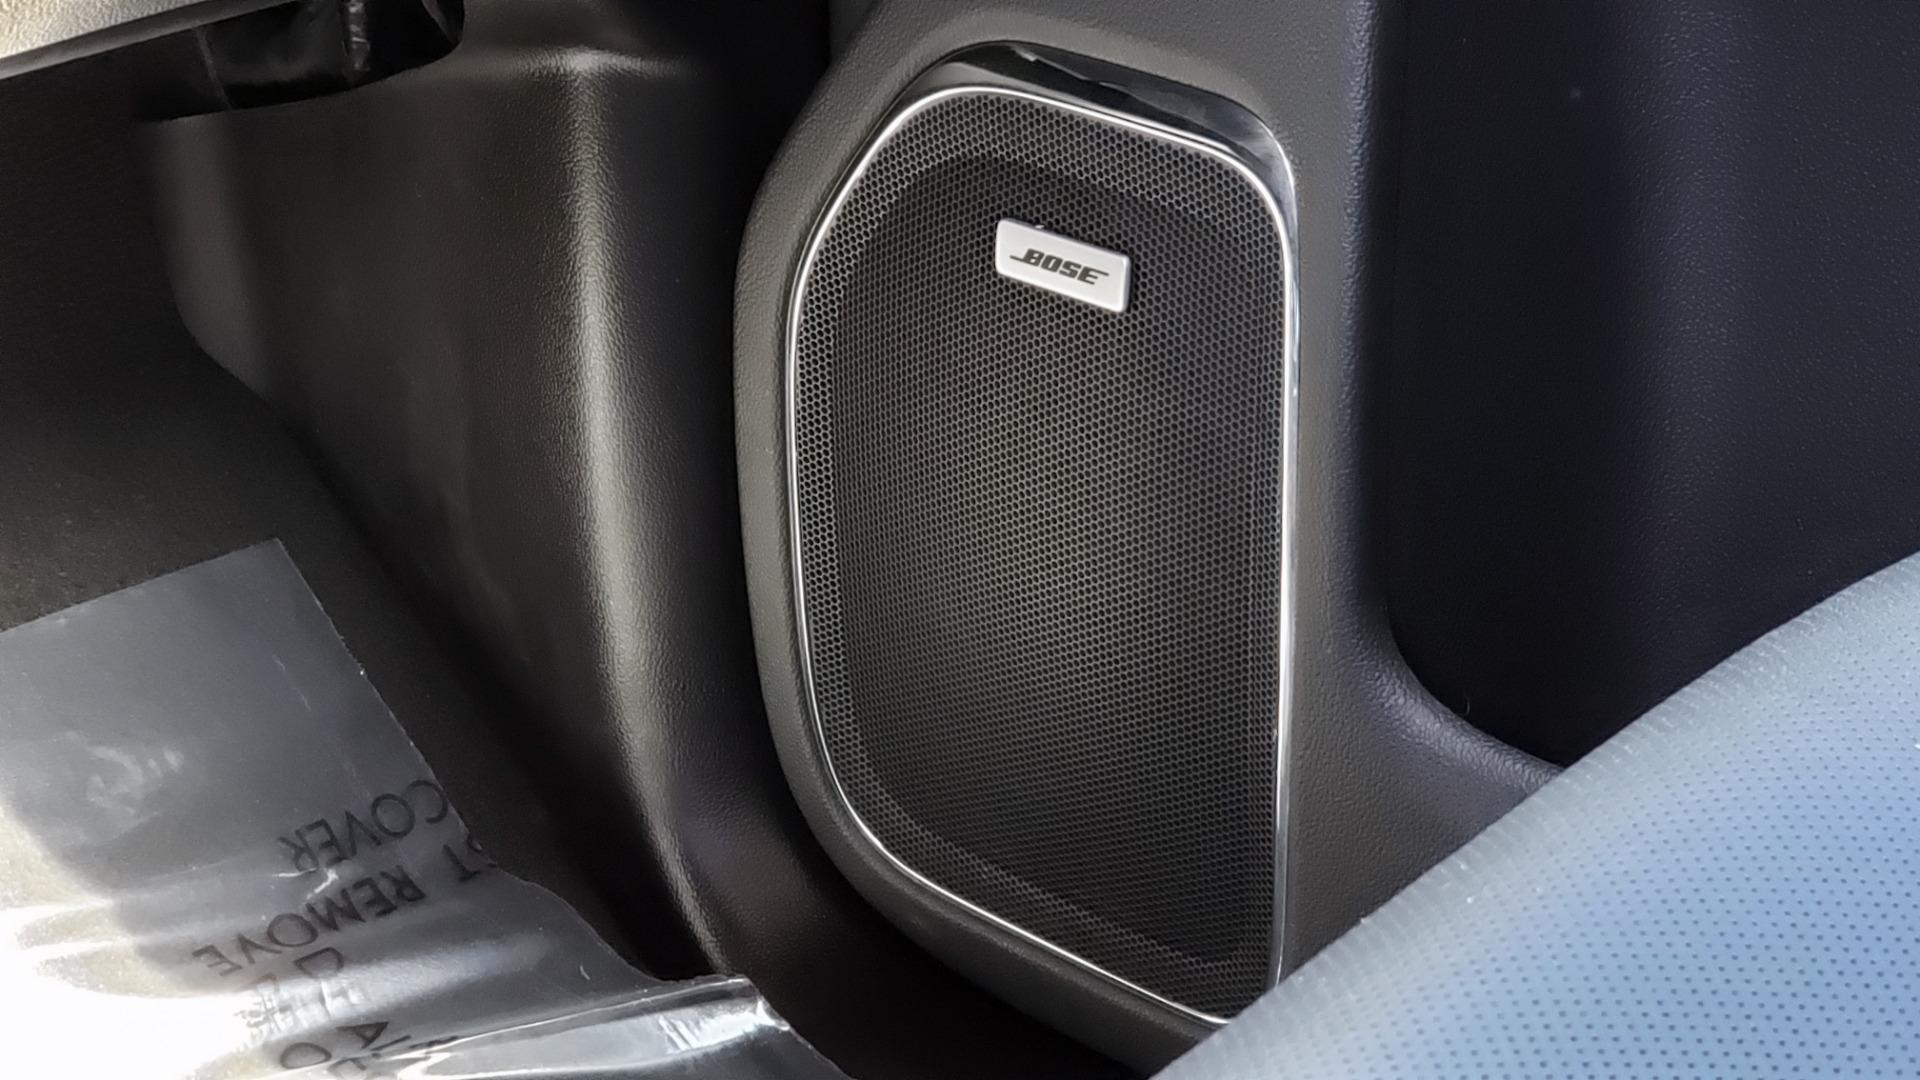 Used 2015 GMC SIERRA 2500HD DENALI 4WD CREWCAB / 6.6L DURAMAX / 6-SPD AUTO / NAV / BOSE for sale $50,995 at Formula Imports in Charlotte NC 28227 62